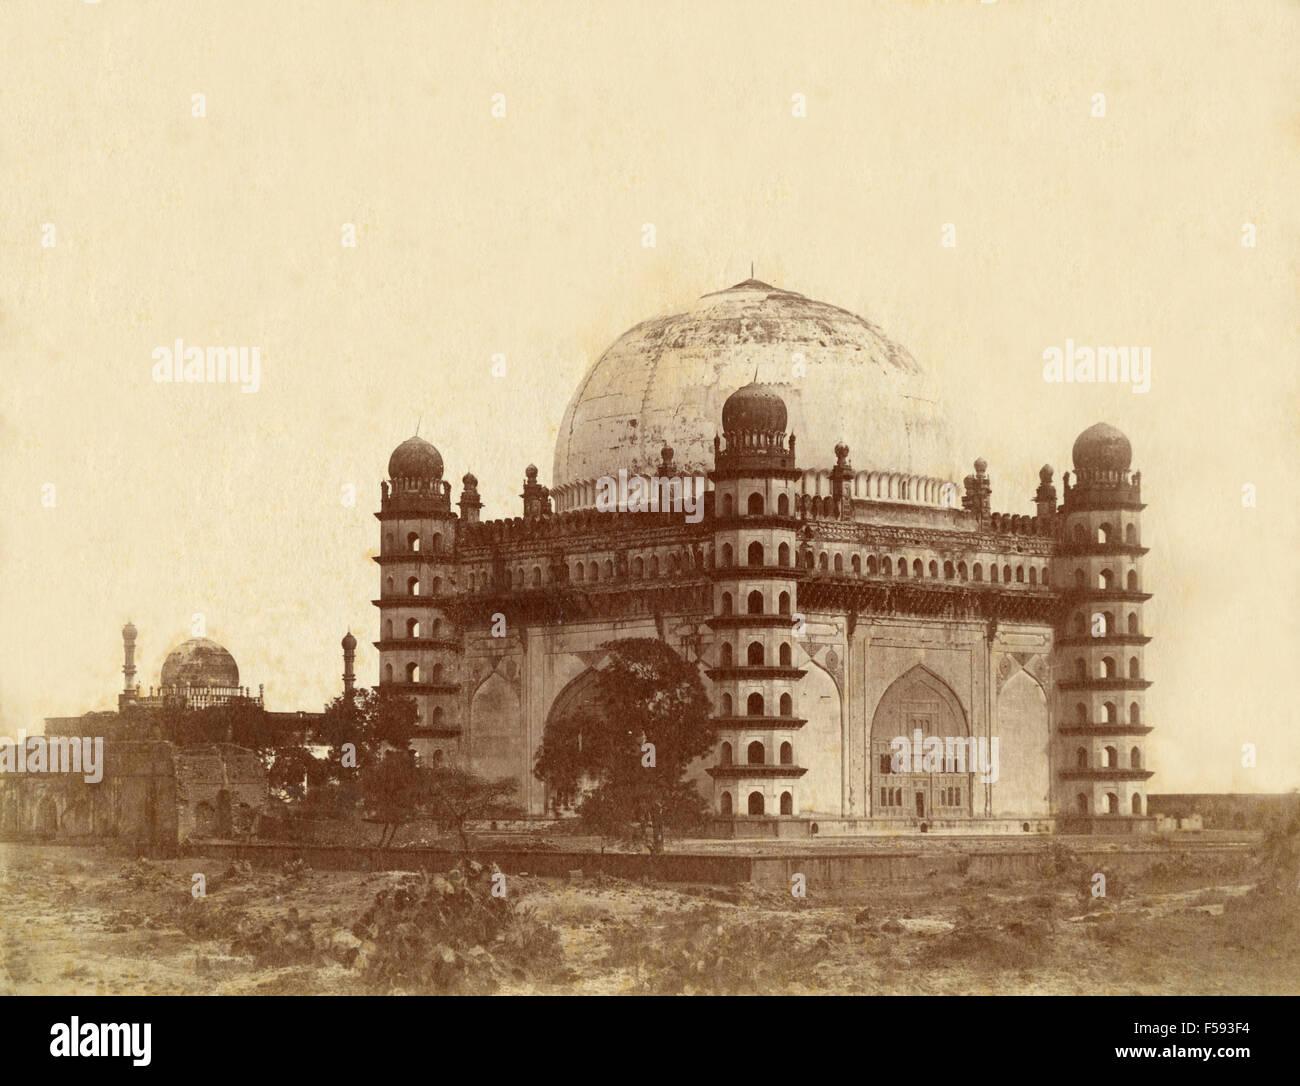 The Gol Gumbaz or Tomb of Sultan Muhammad, Bijapur, India - Stock Image